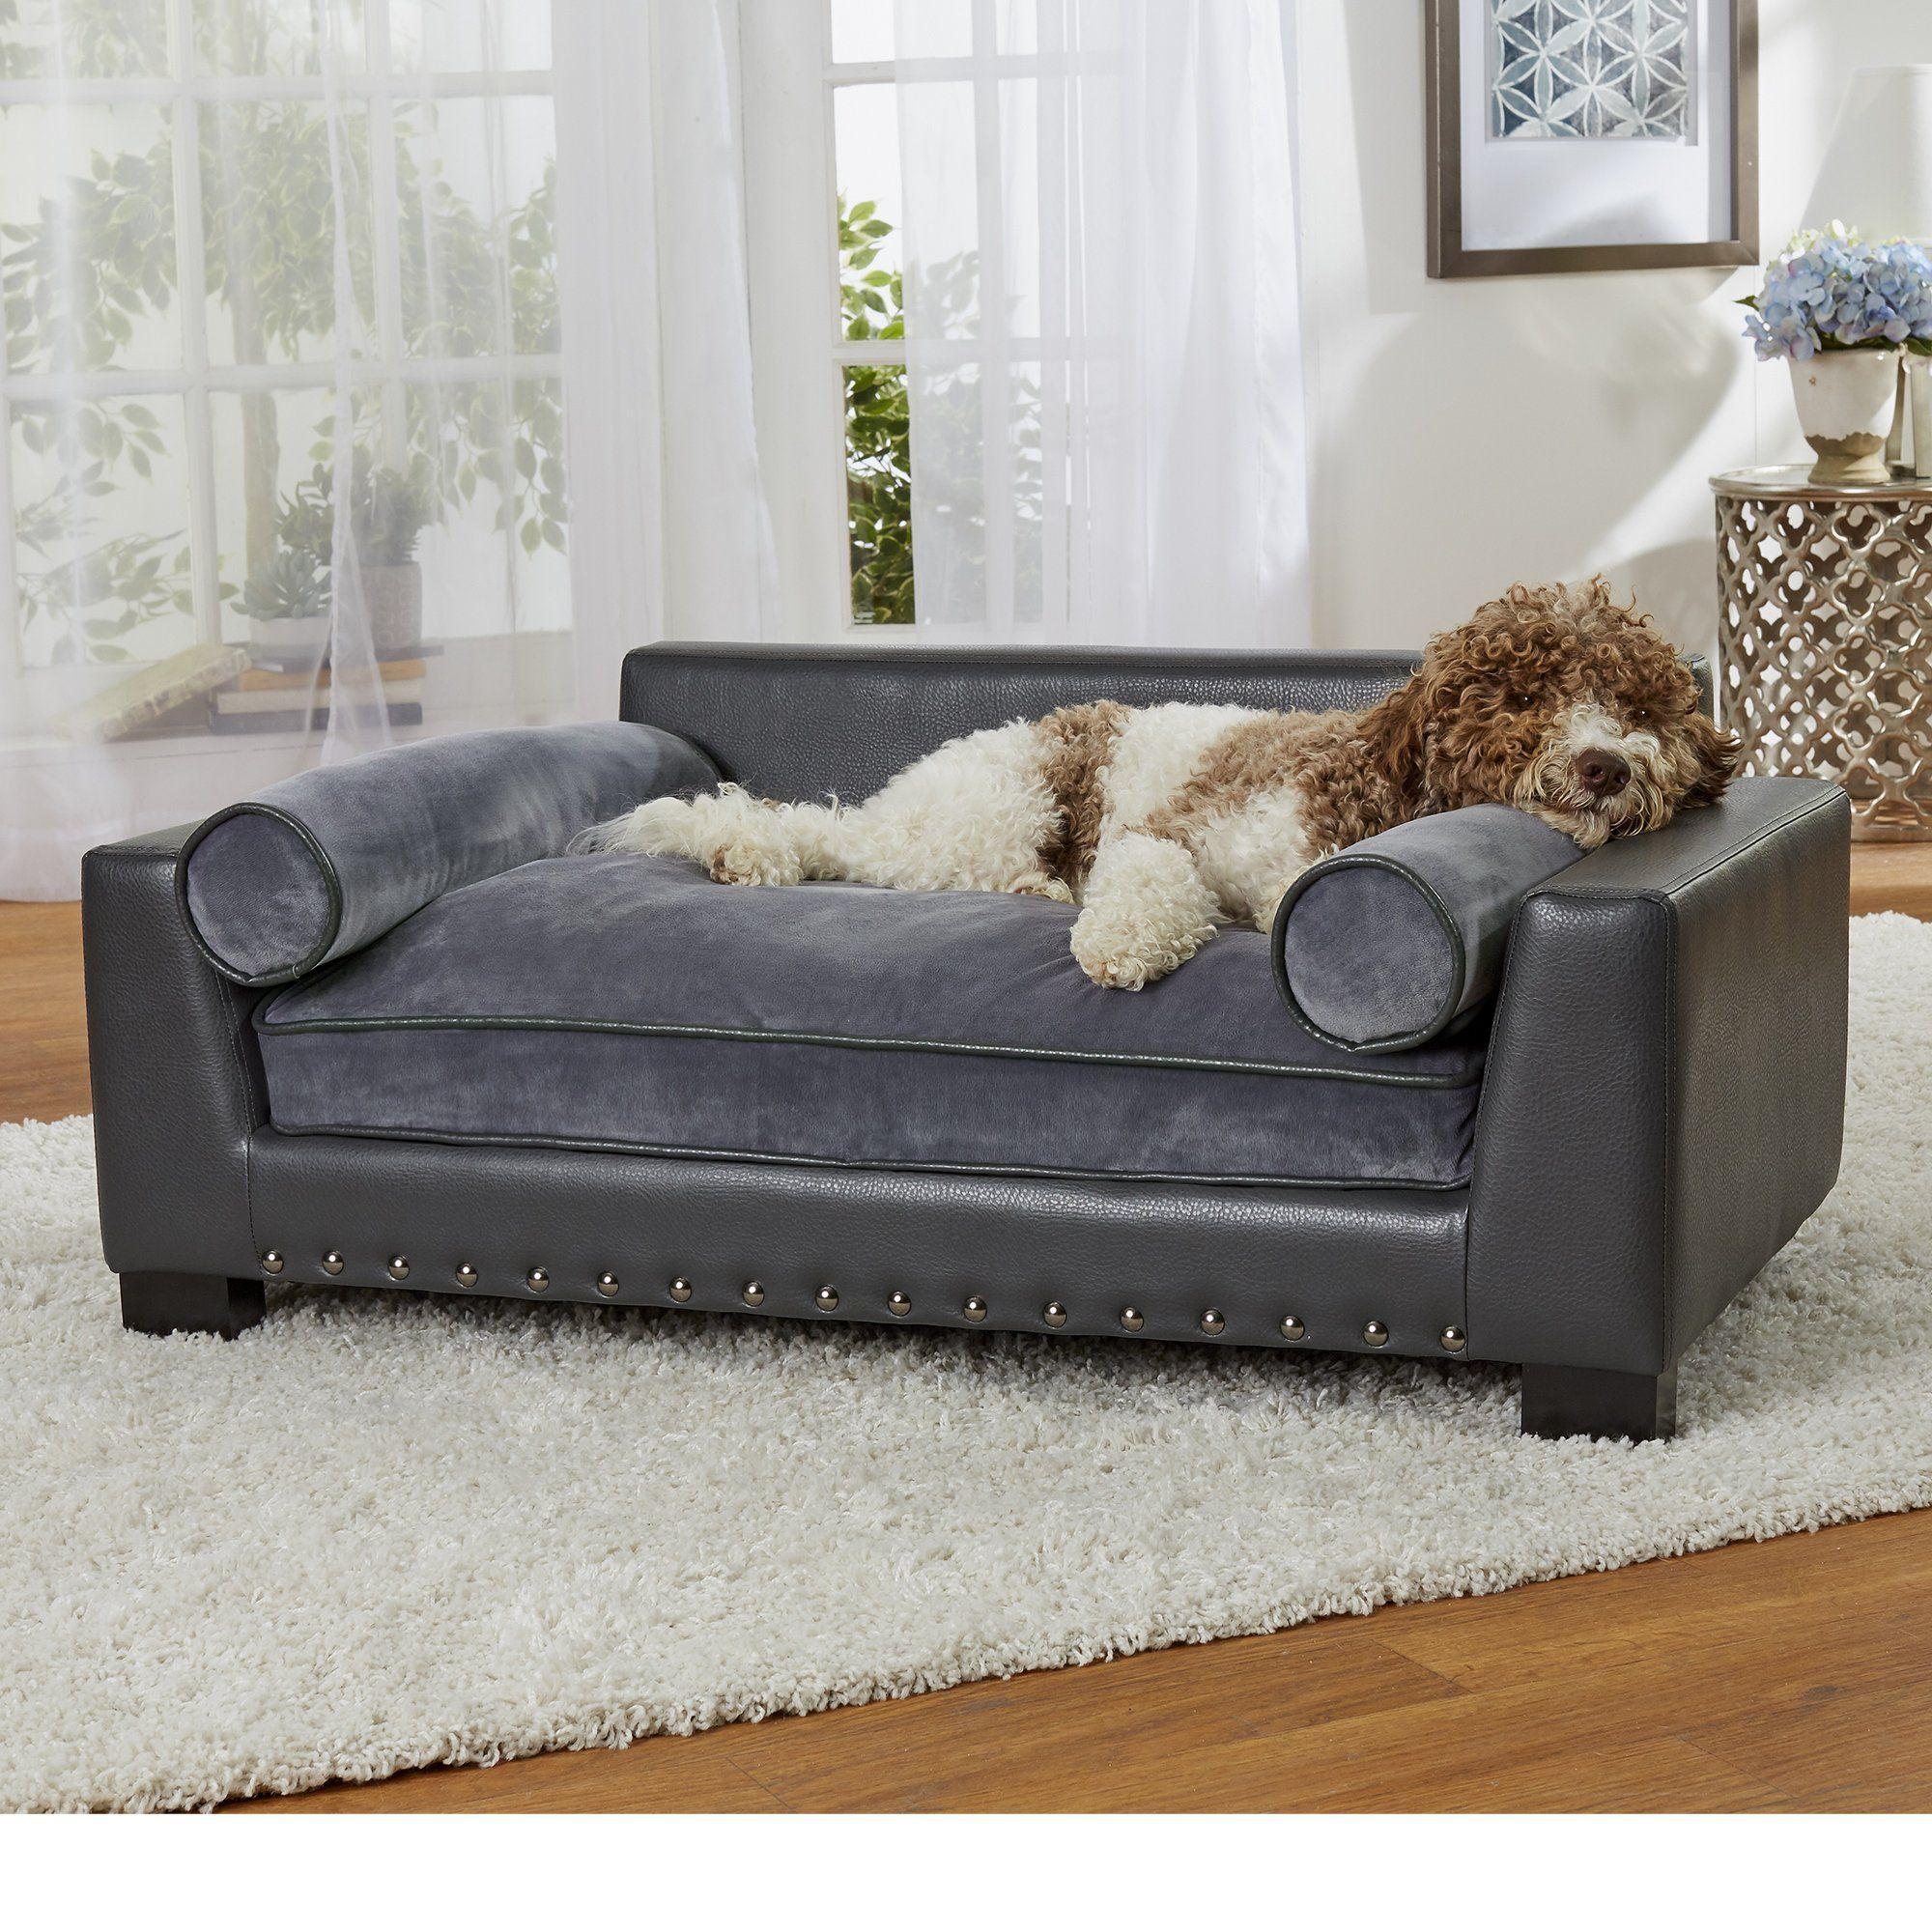 Enchanted Home Pet Skylar Dark Grey Sofa For Dog 42 L X 26 W Dog Sofa Bed Dog Bed Sofa Bed